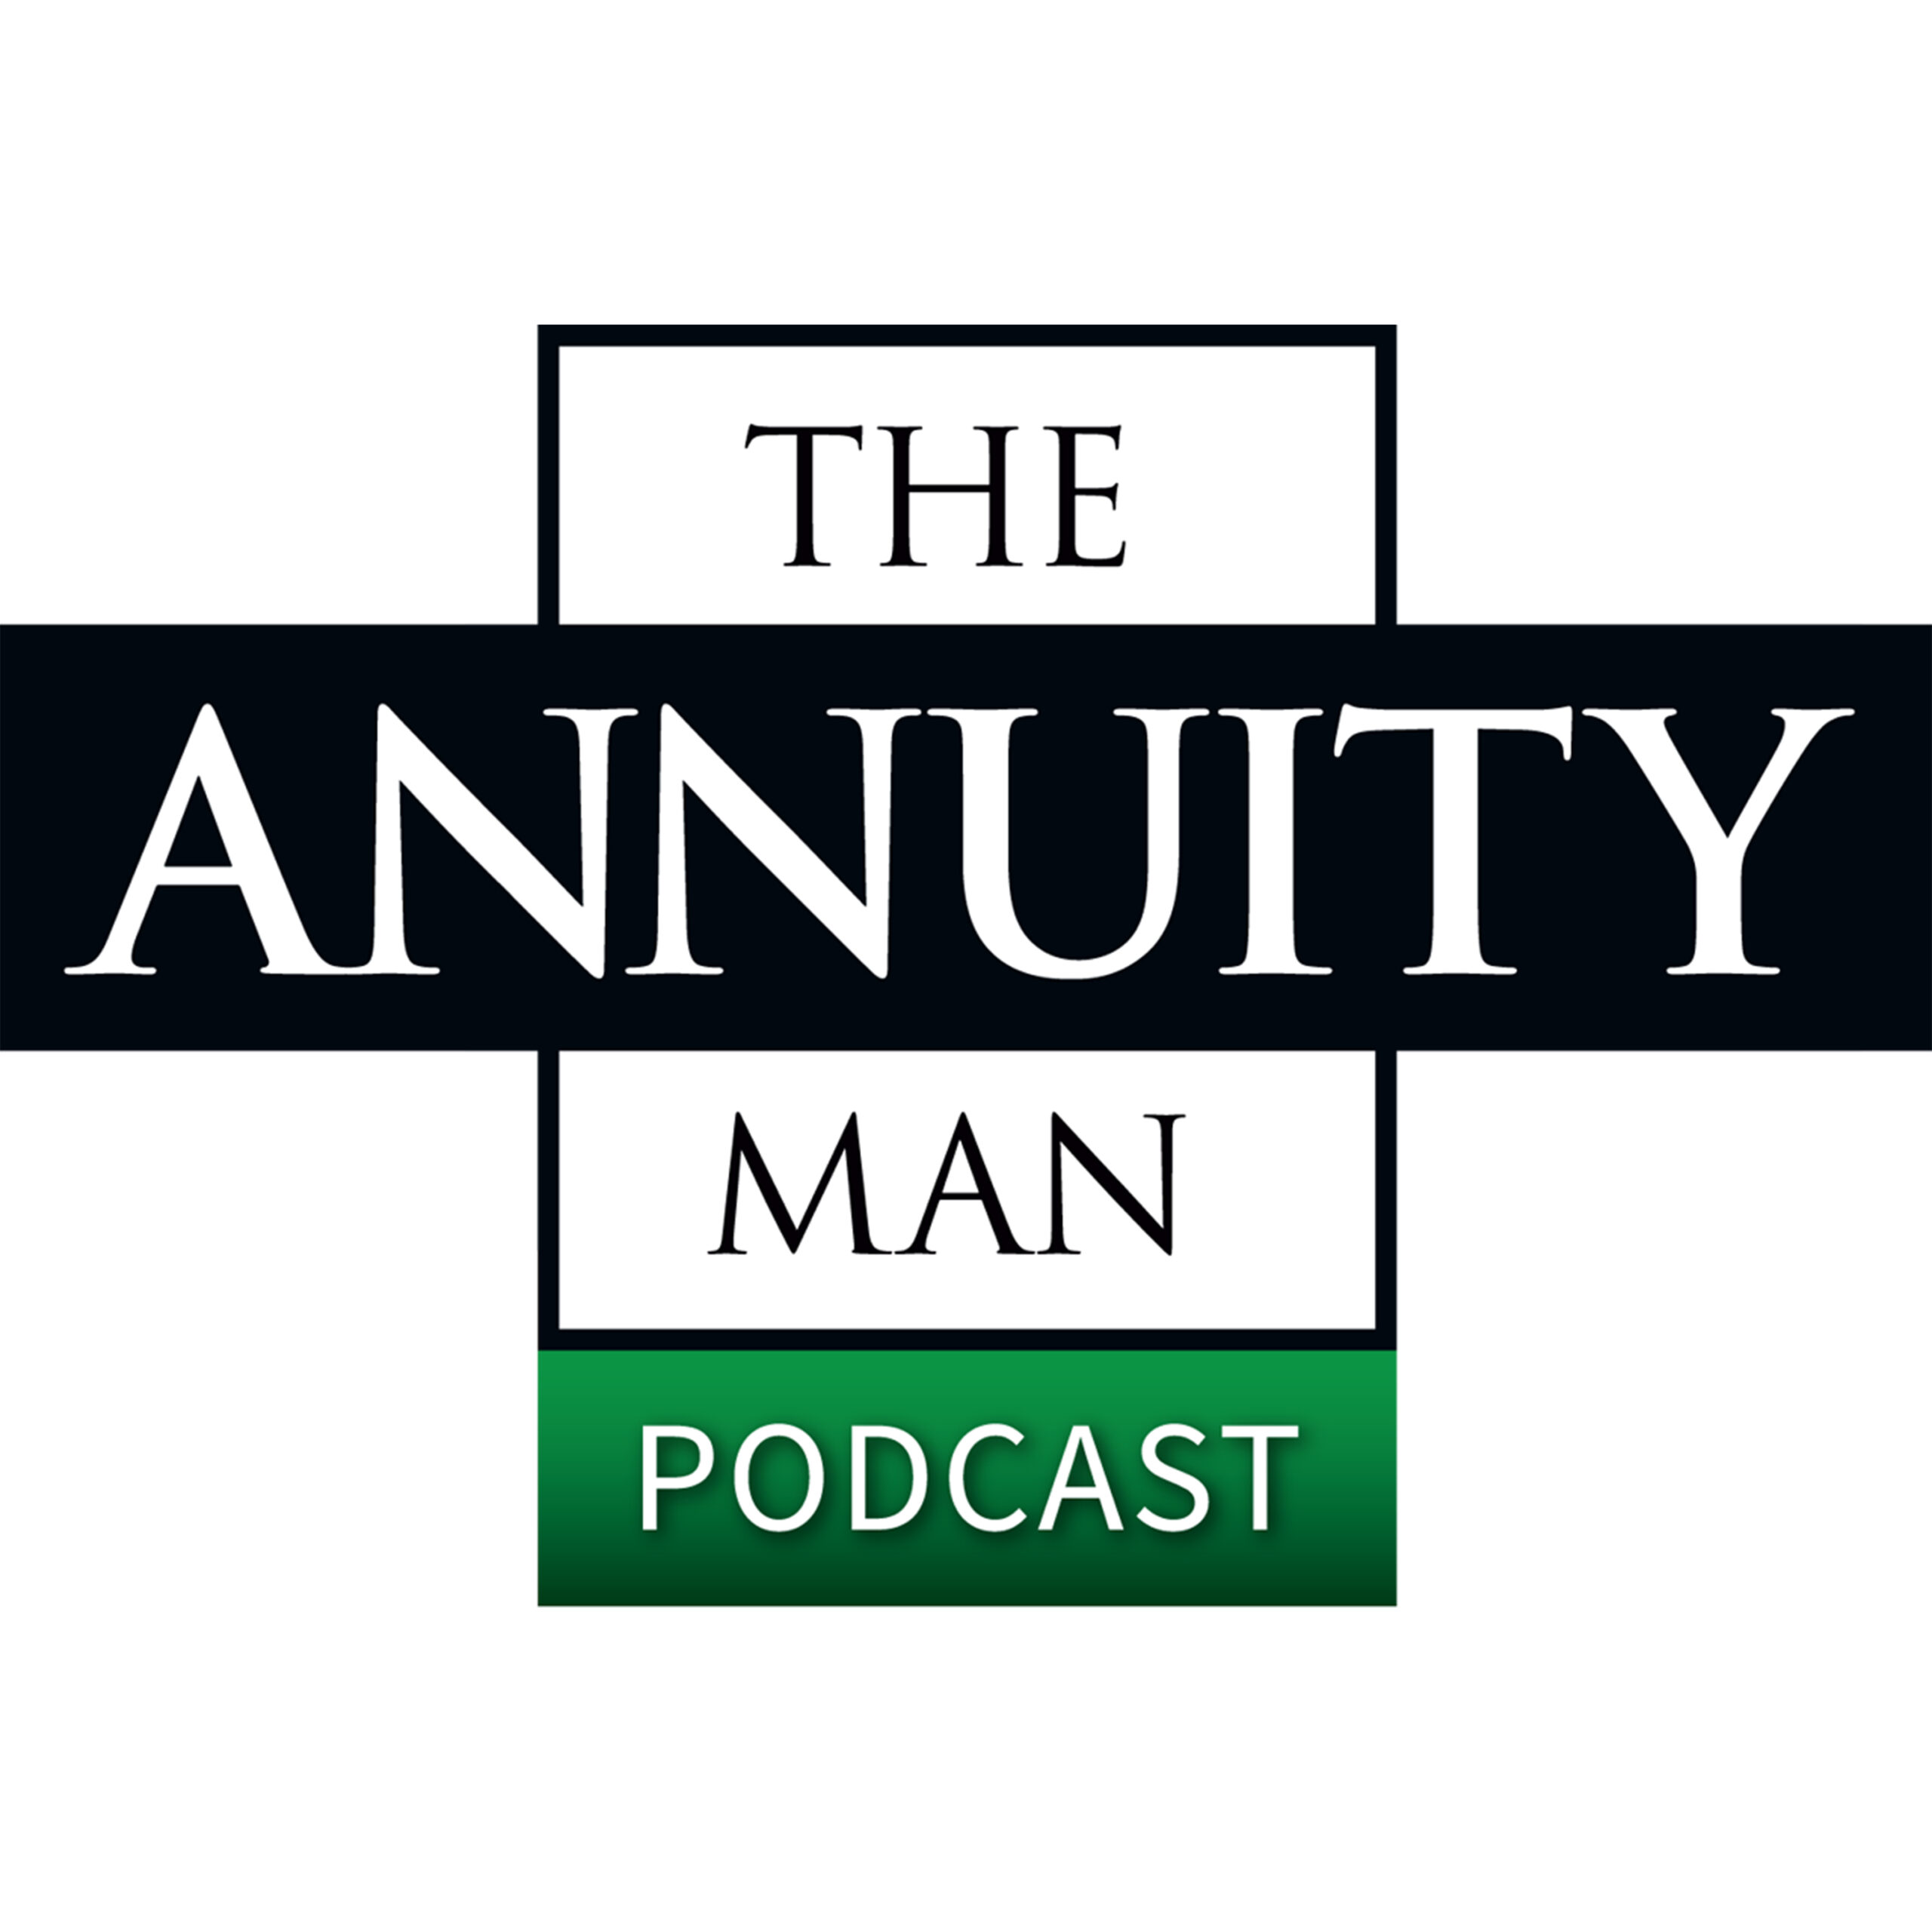 The Annuity Man Podcast